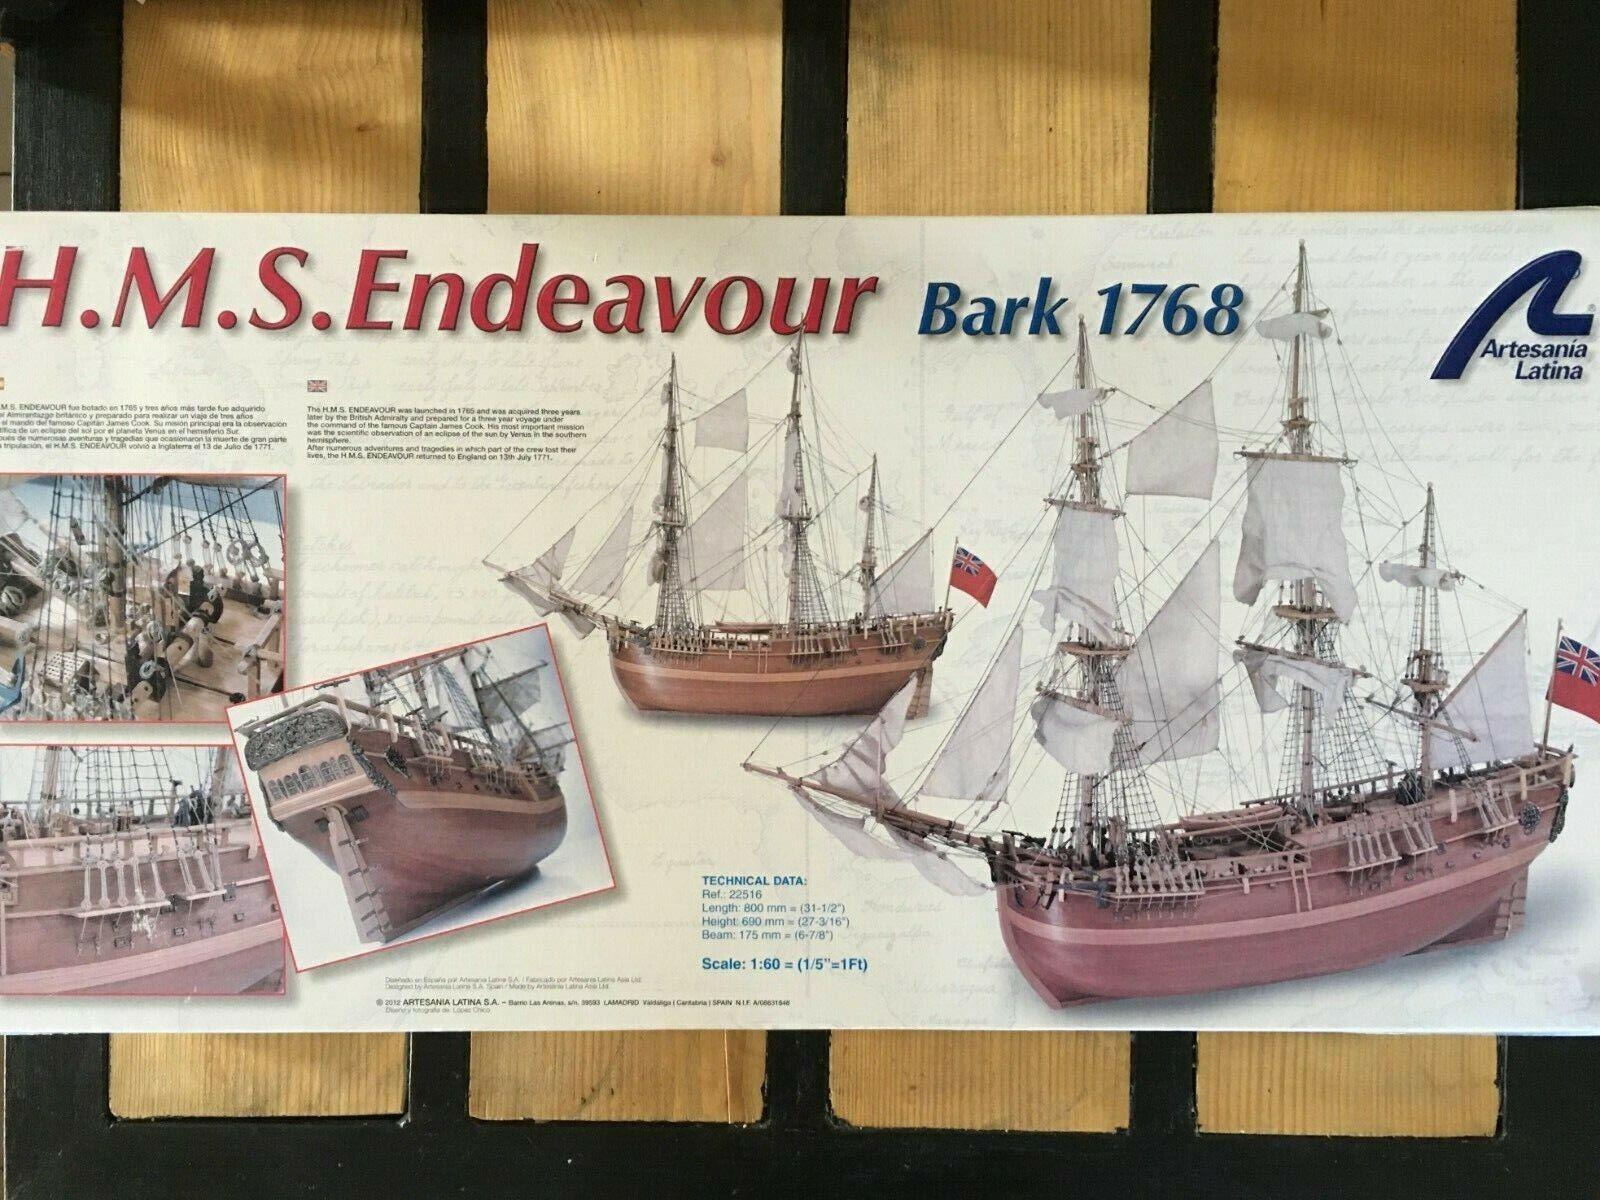 Bateau en bois ARTESANIA LATINA 22516 H.M.S. Endeavour Bark 1769 160.